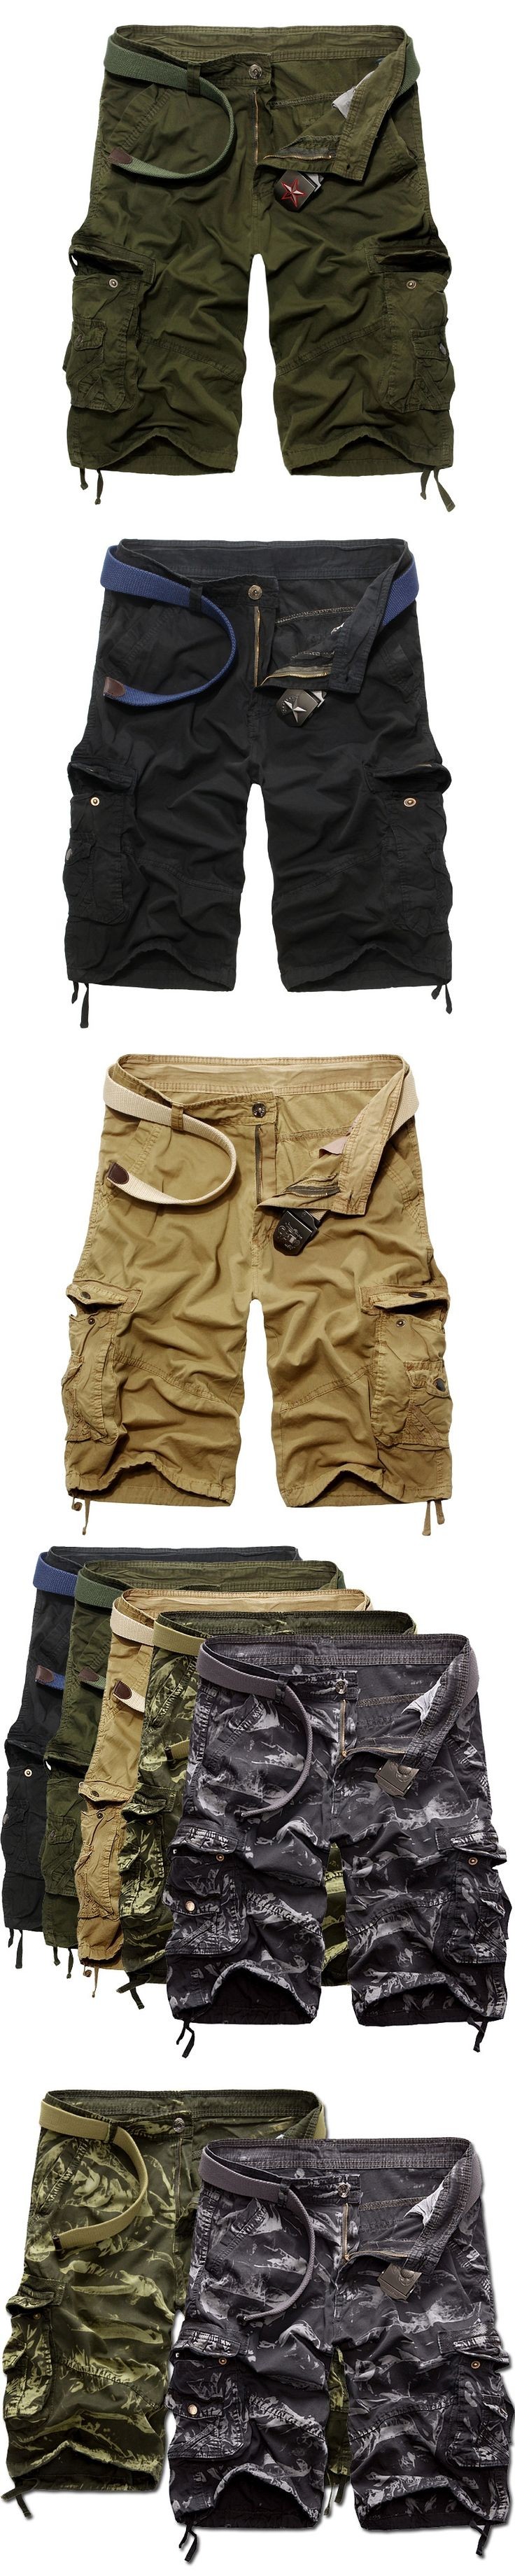 Mens Cargo Shorts 2017 Brand New Army Camouflage Shorts Men Cotton Pantalon Corto Hombre Casual Camo Shorts Bermudas Plus Size